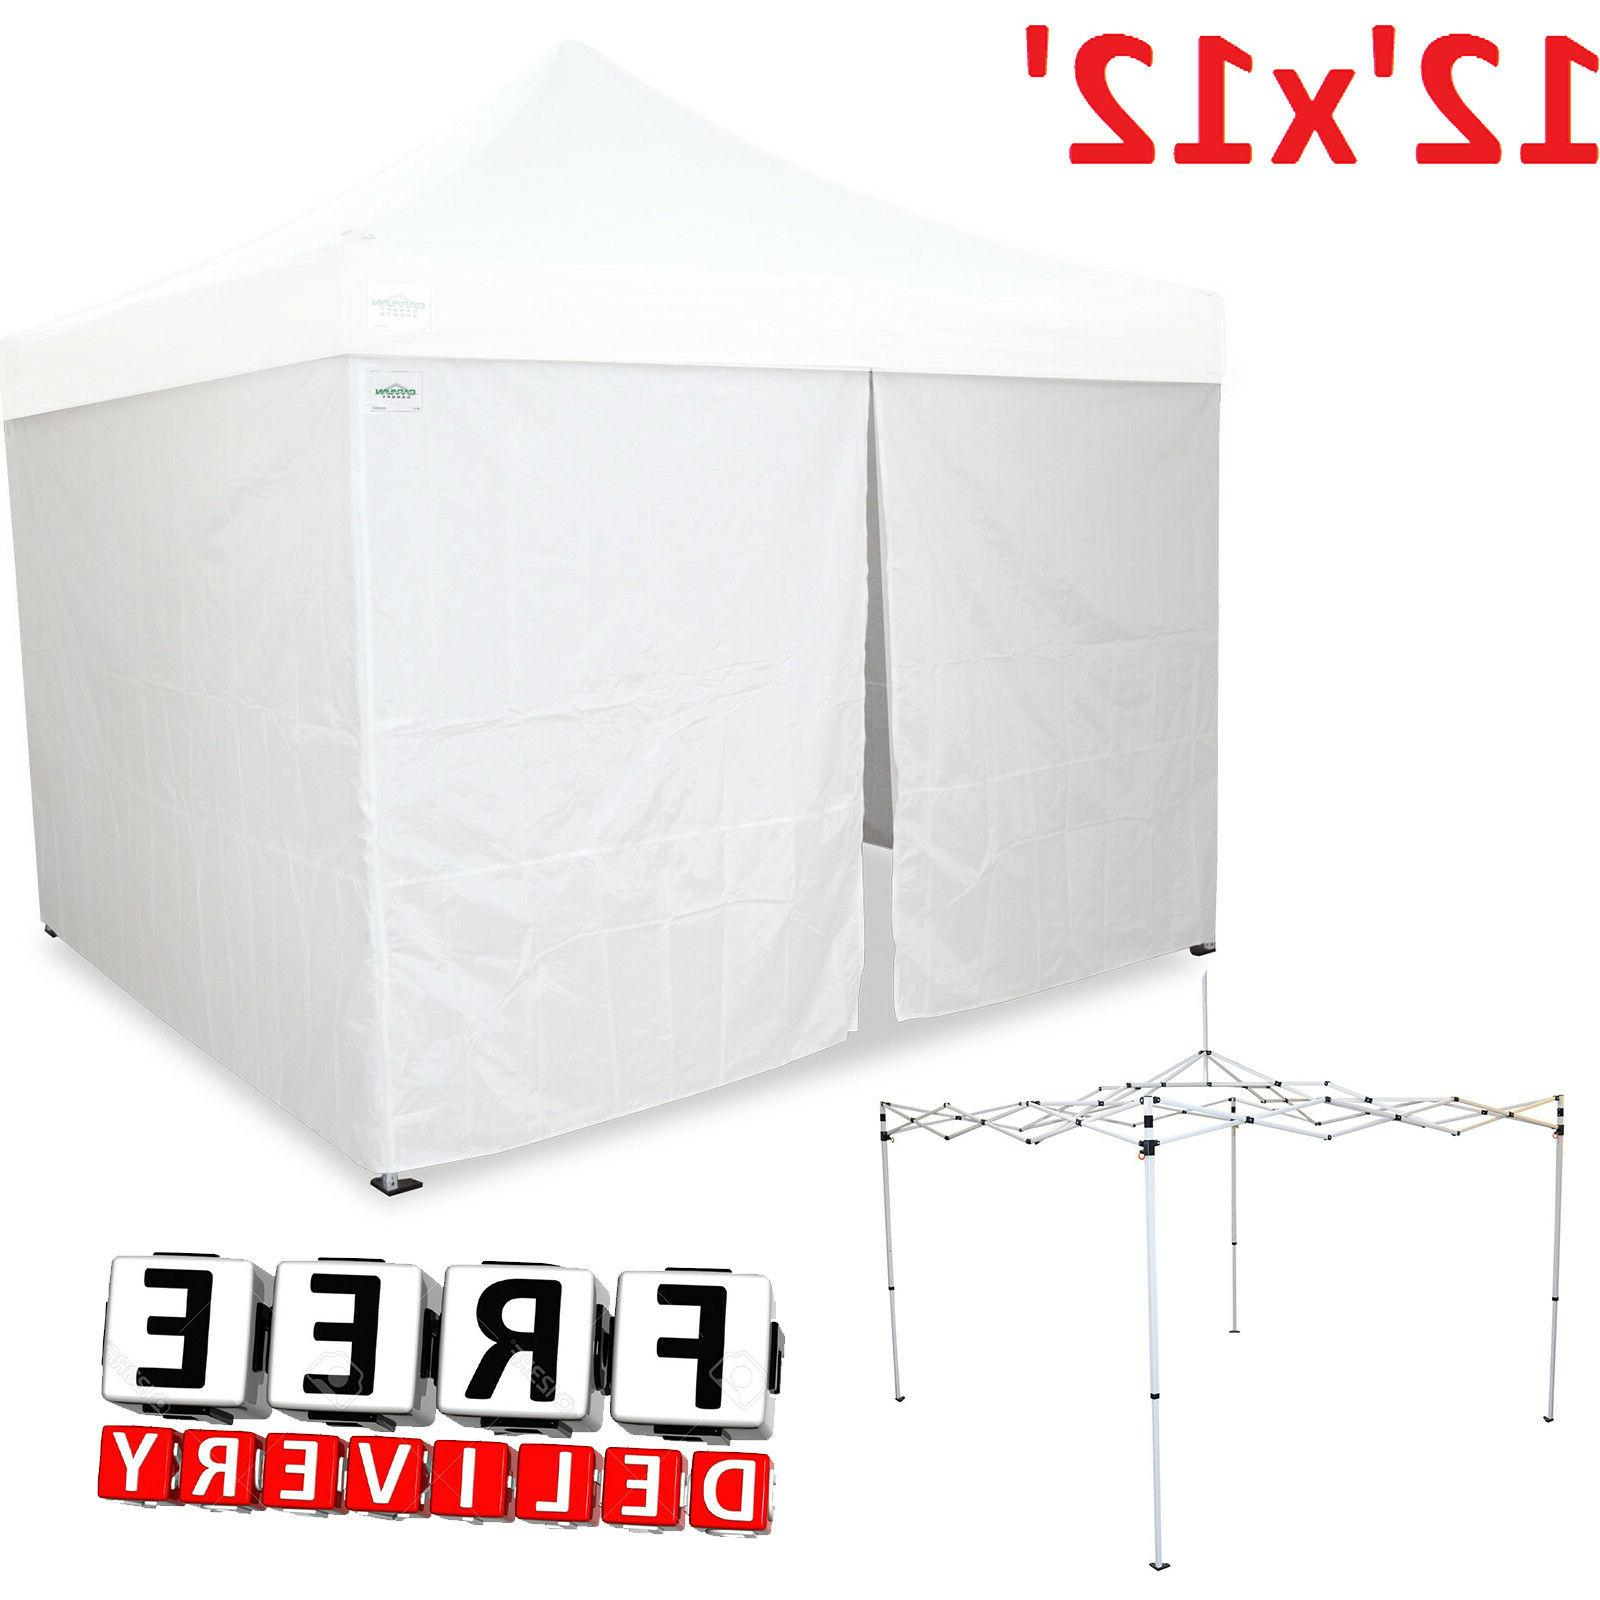 Caravan Canopy 12x12' Portable Shelter Steel Enclosure Side